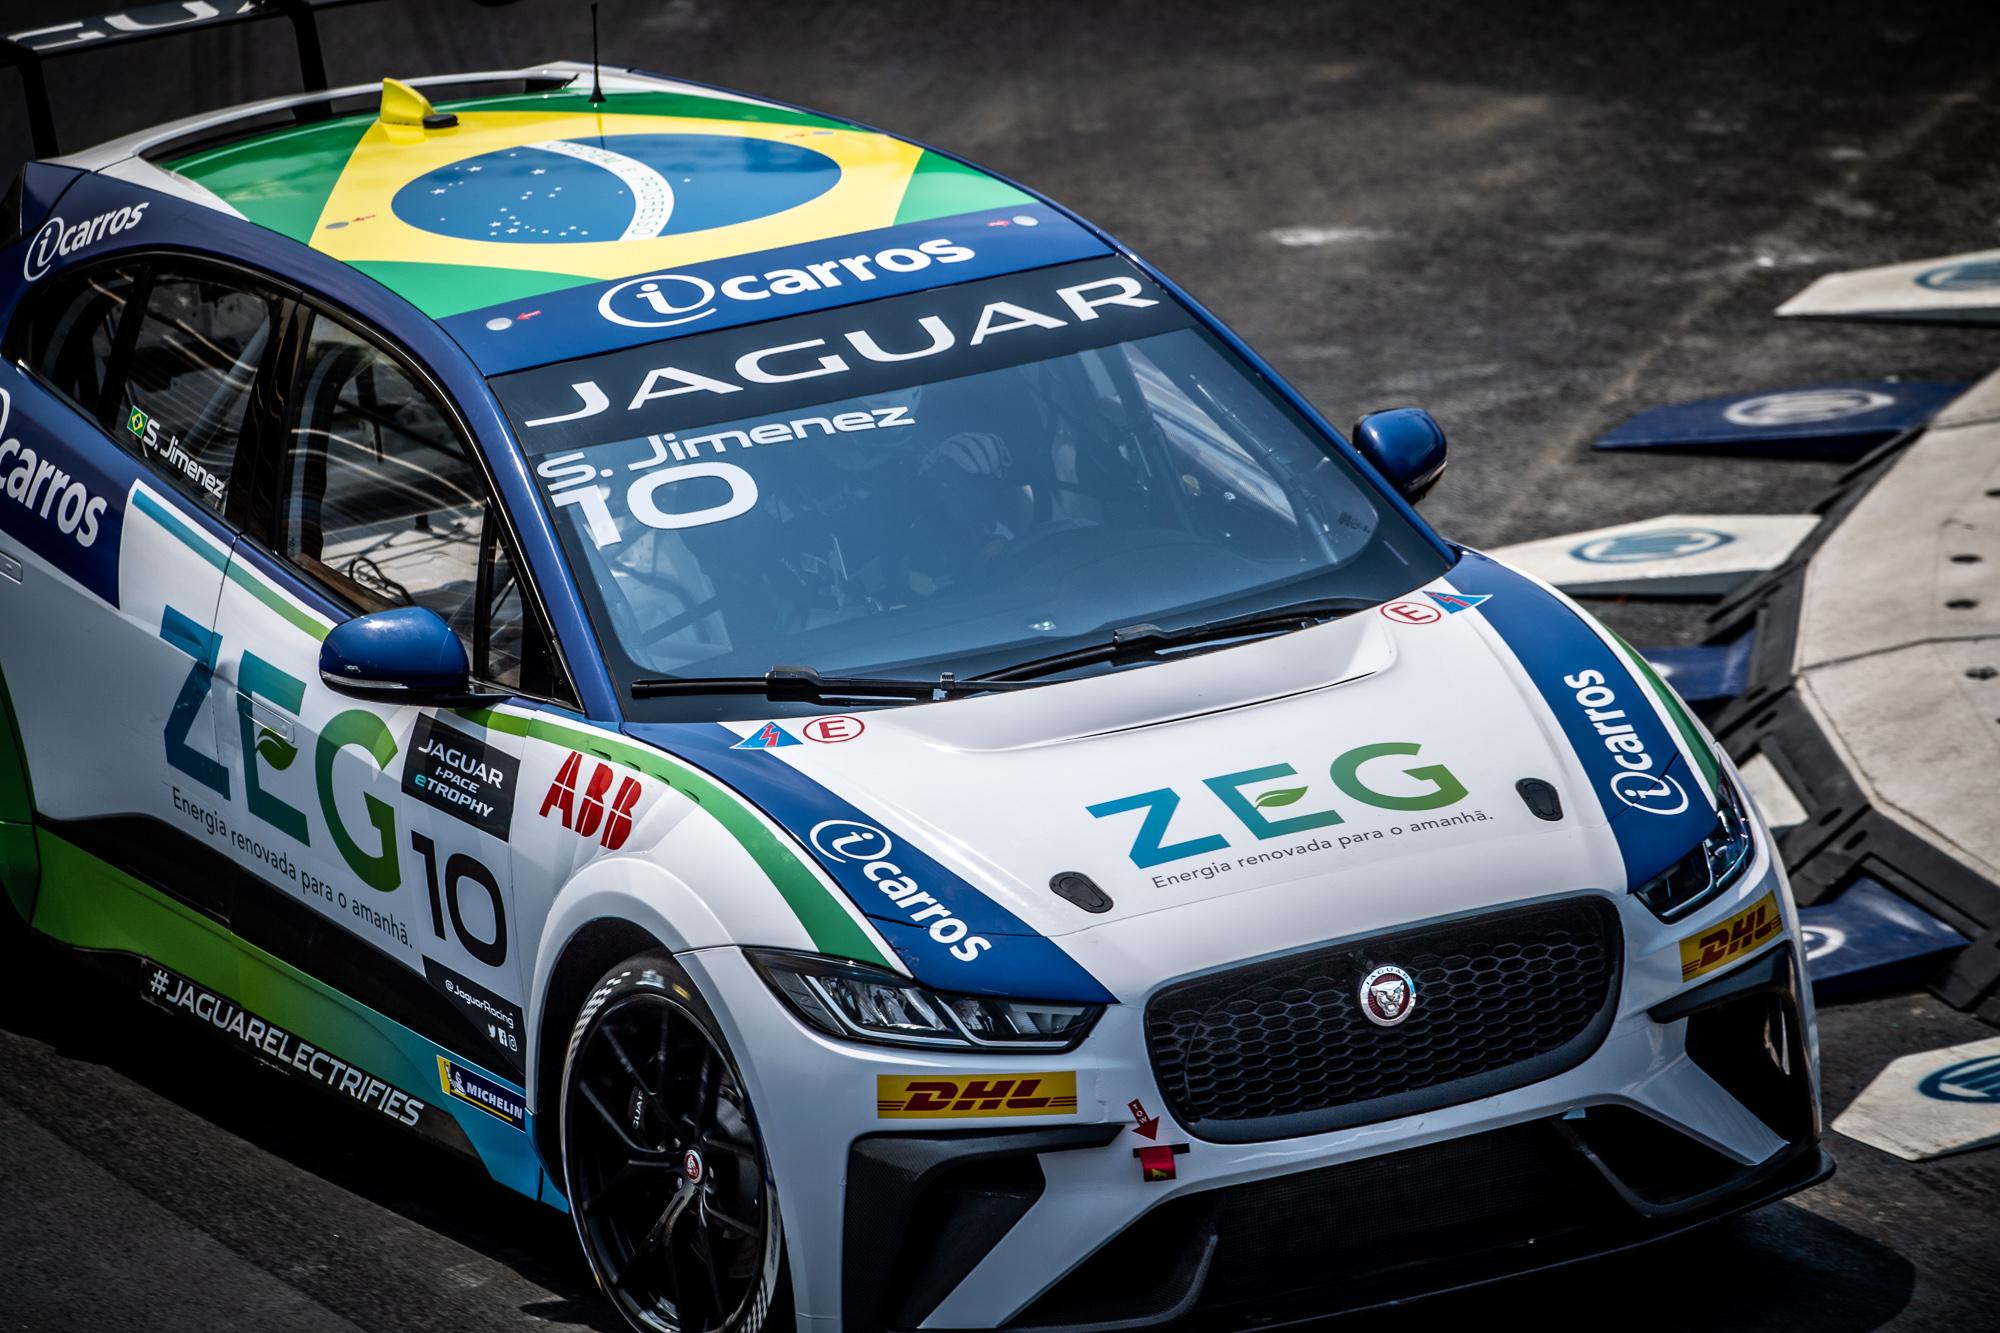 Jaguar_4.Sanya_josemariodias_03032